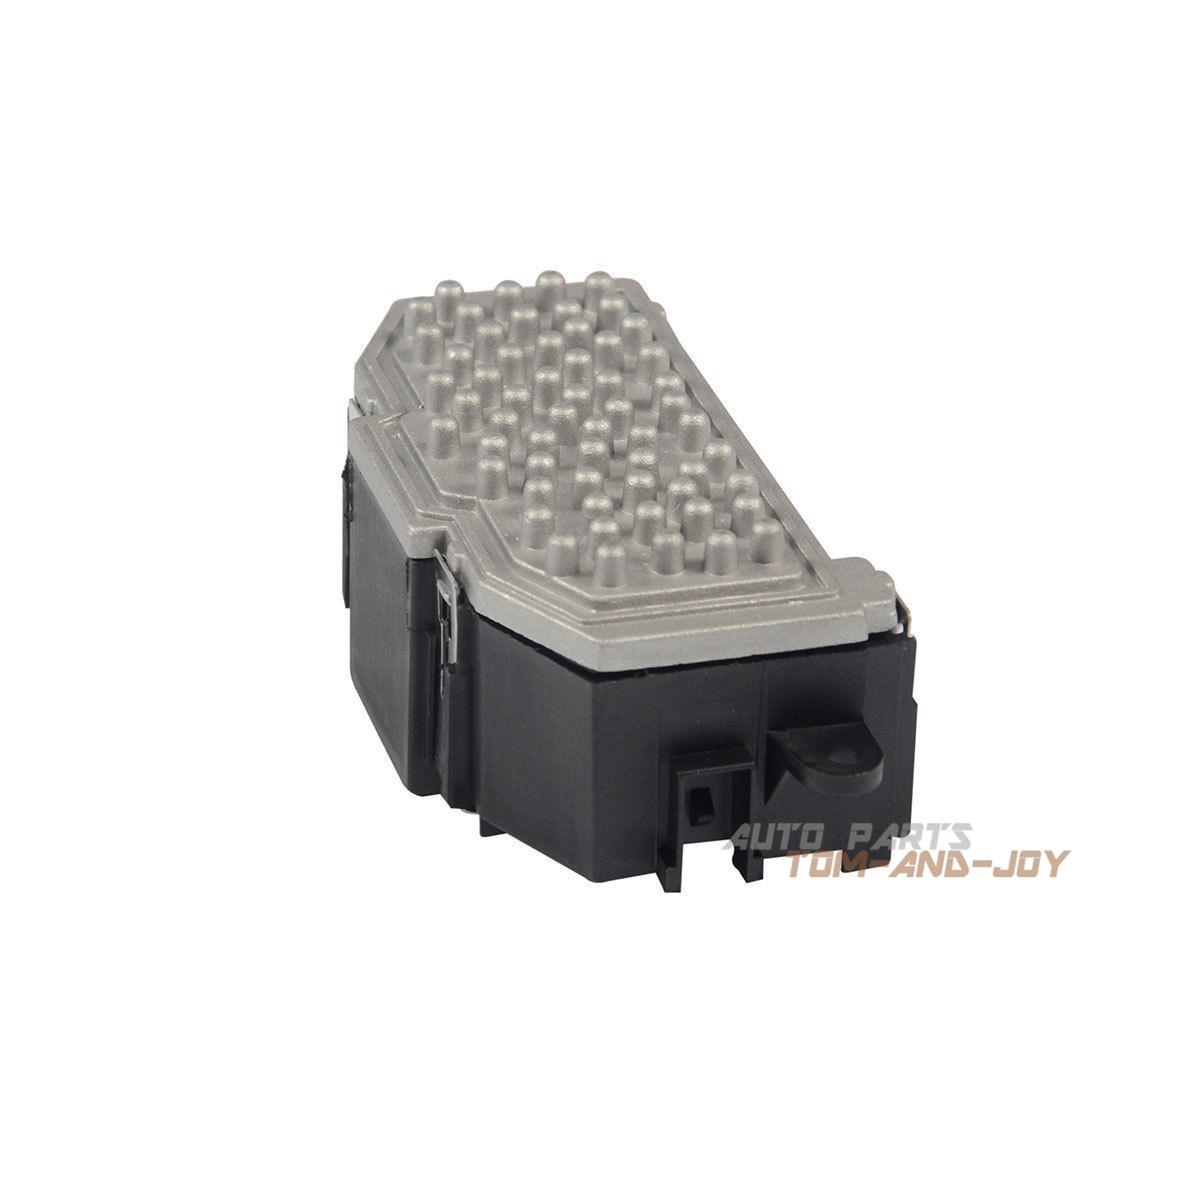 Heater Blower Motor Resistor For VW GTI Jetta Passat Tiguan AUDI A3 Q7 TT SKODA